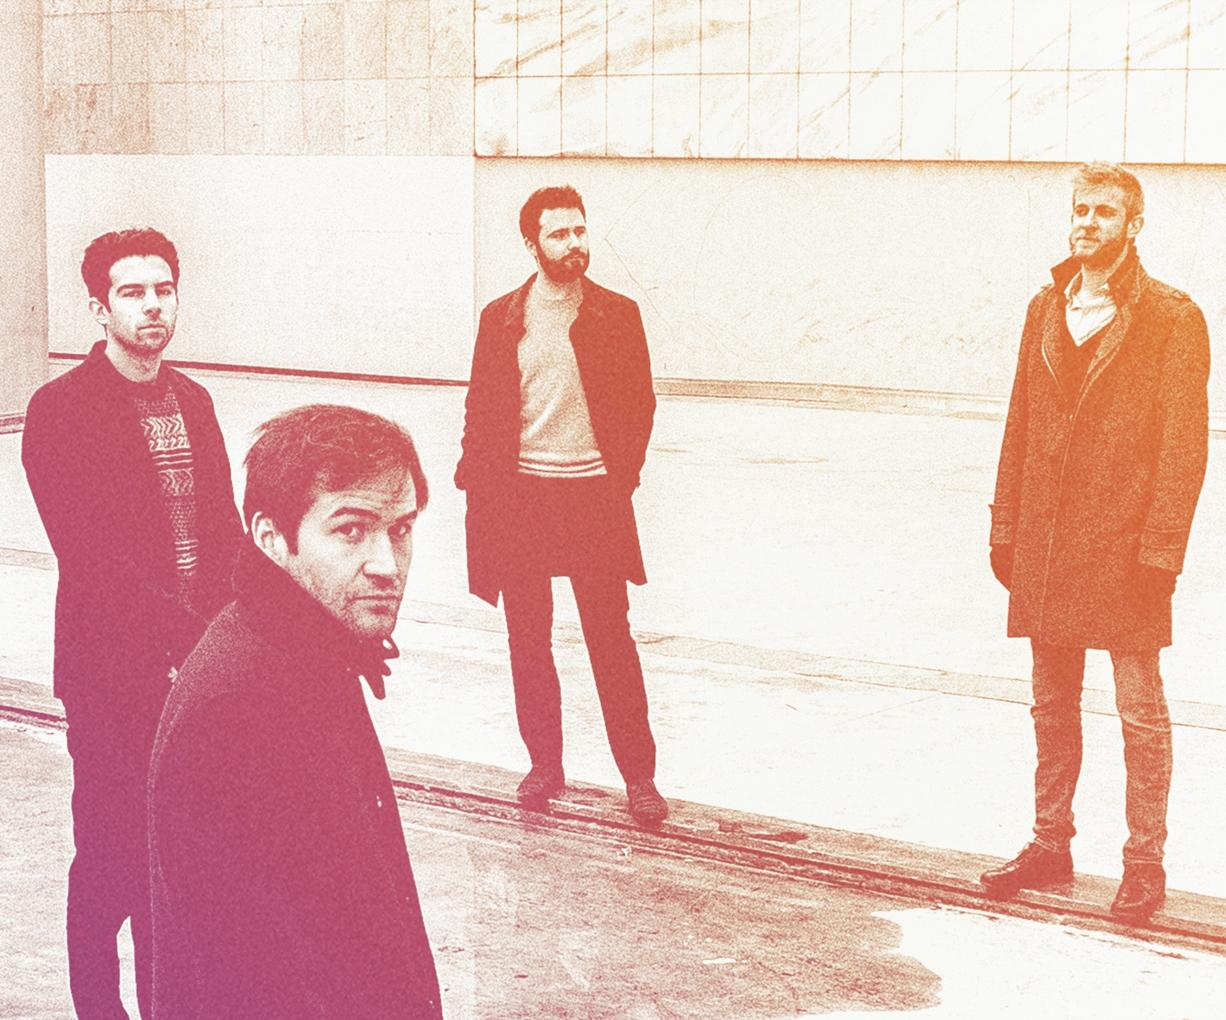 De gauche à droite : Florent Nisse, Gautier Garrigue, David Enhco, Roberto Negro.